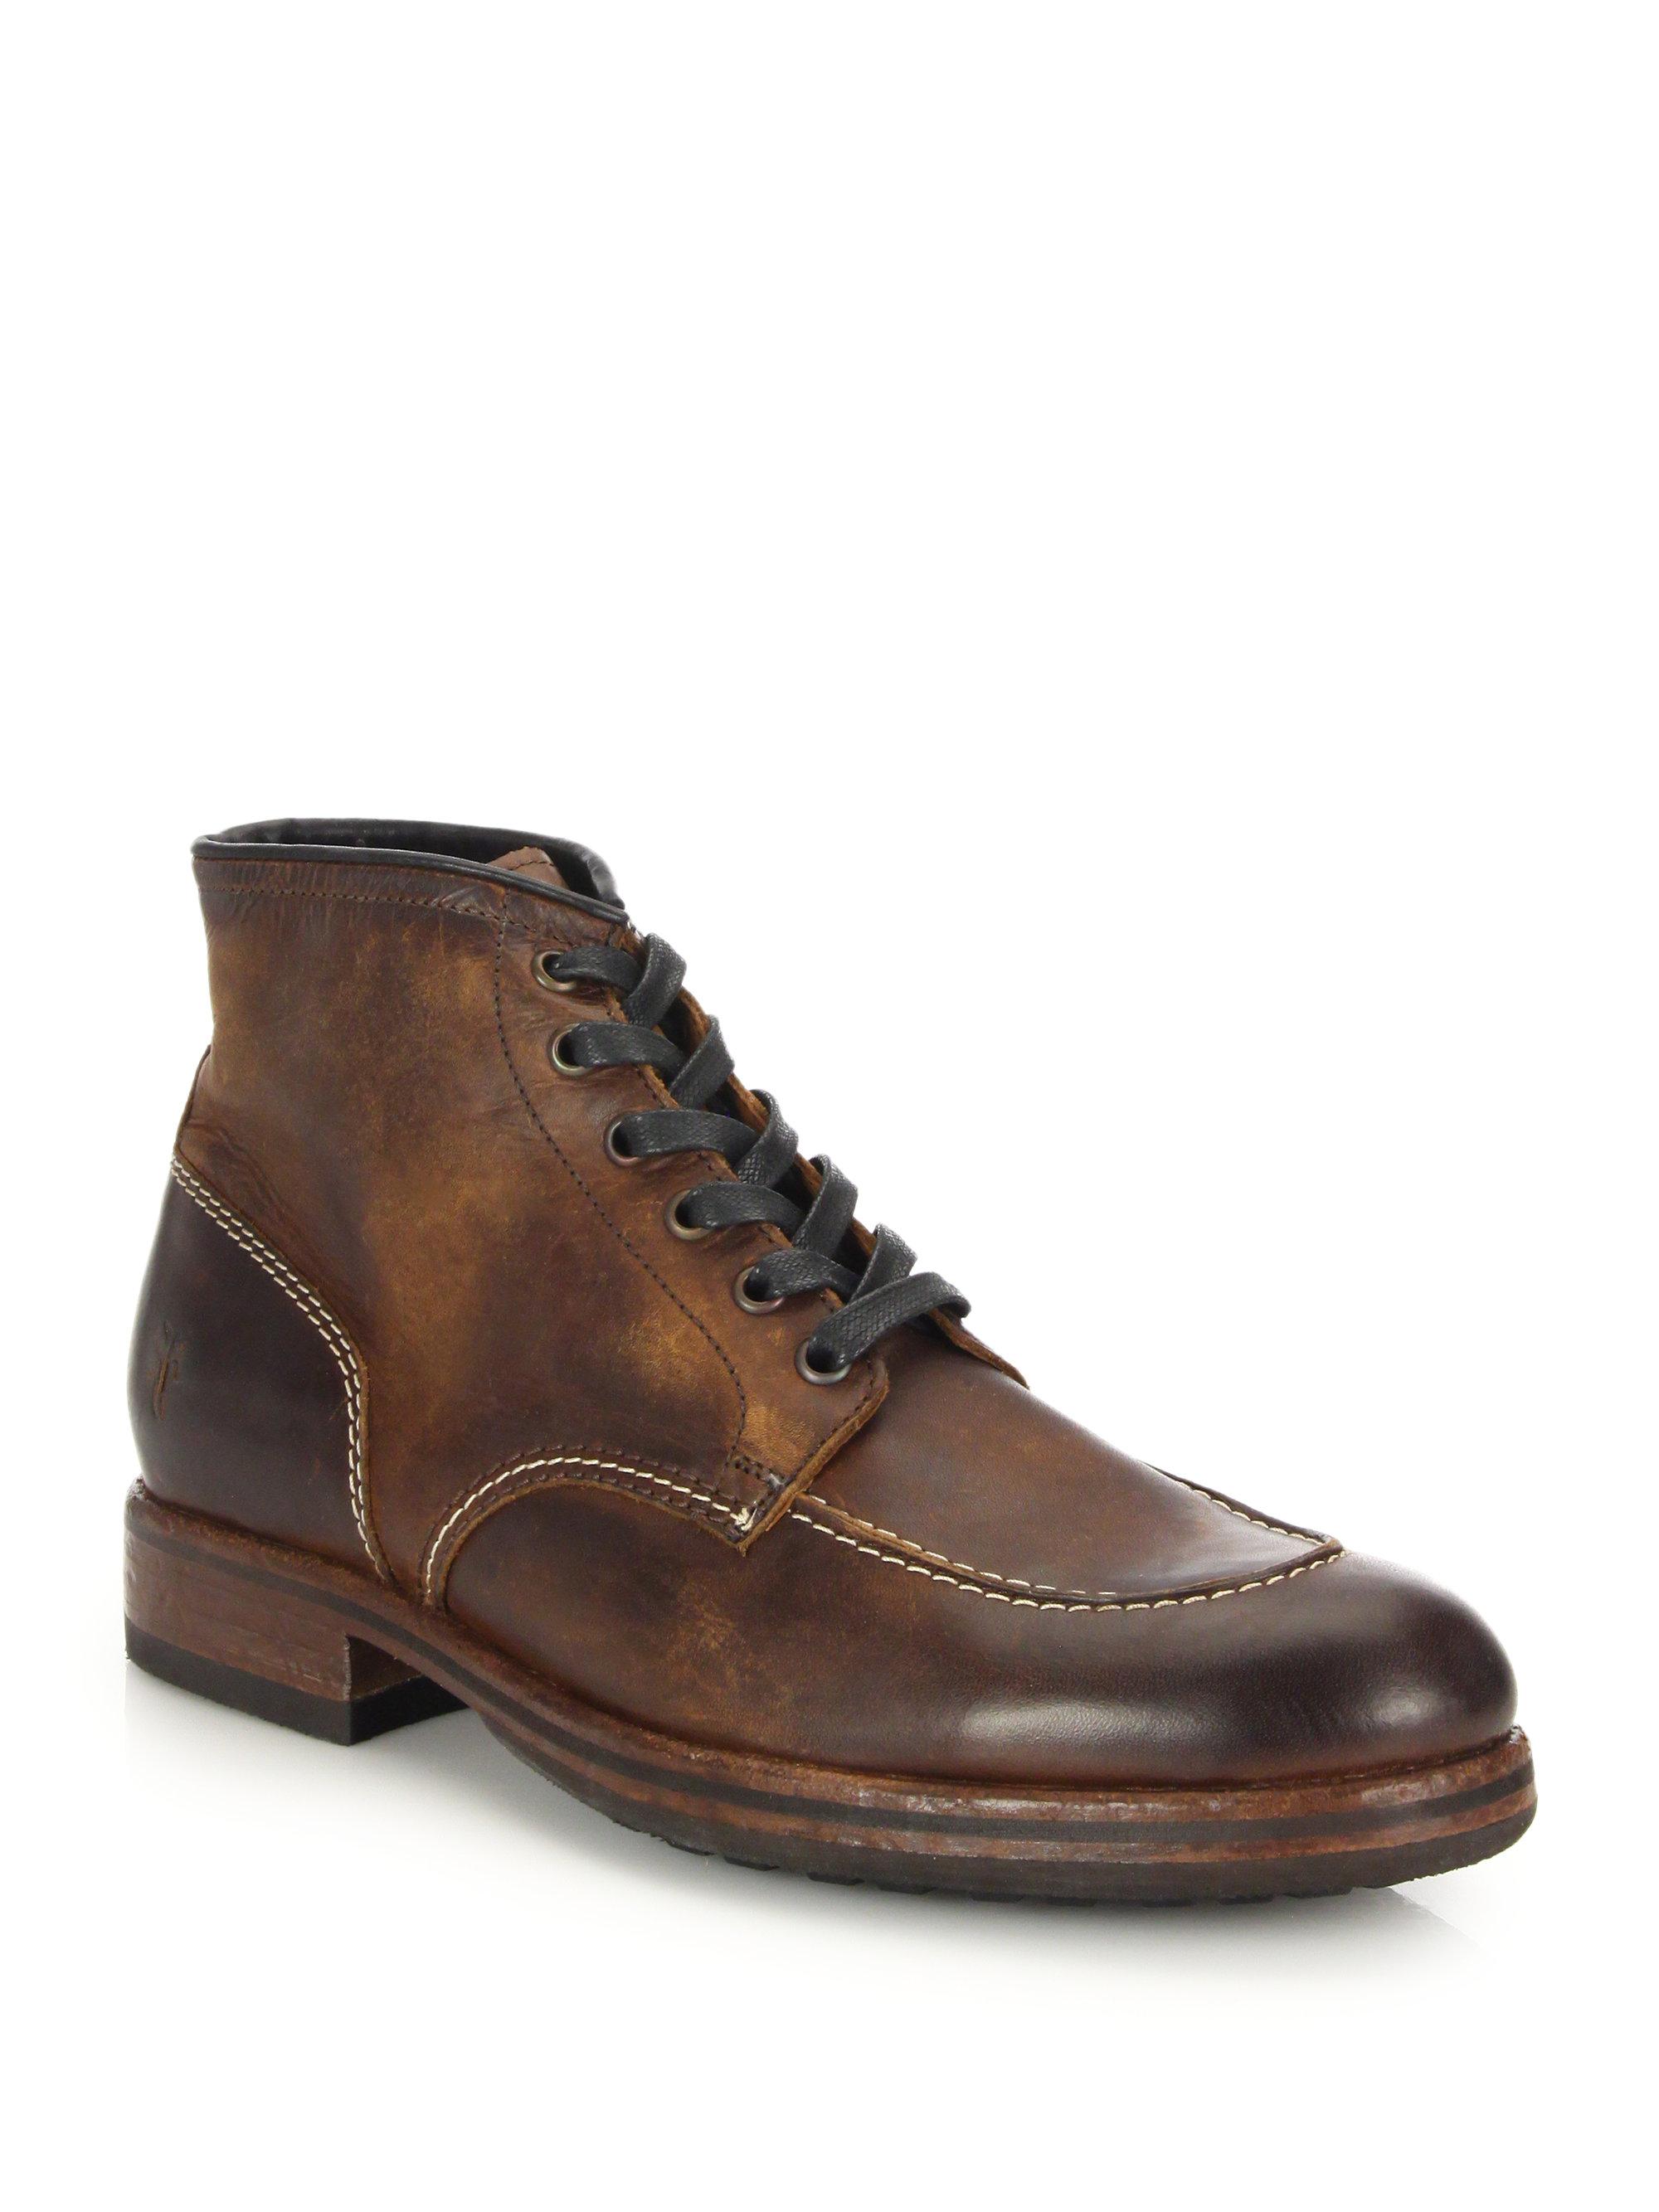 0a0b7ab9f Wilson Boots - Ivoiregion